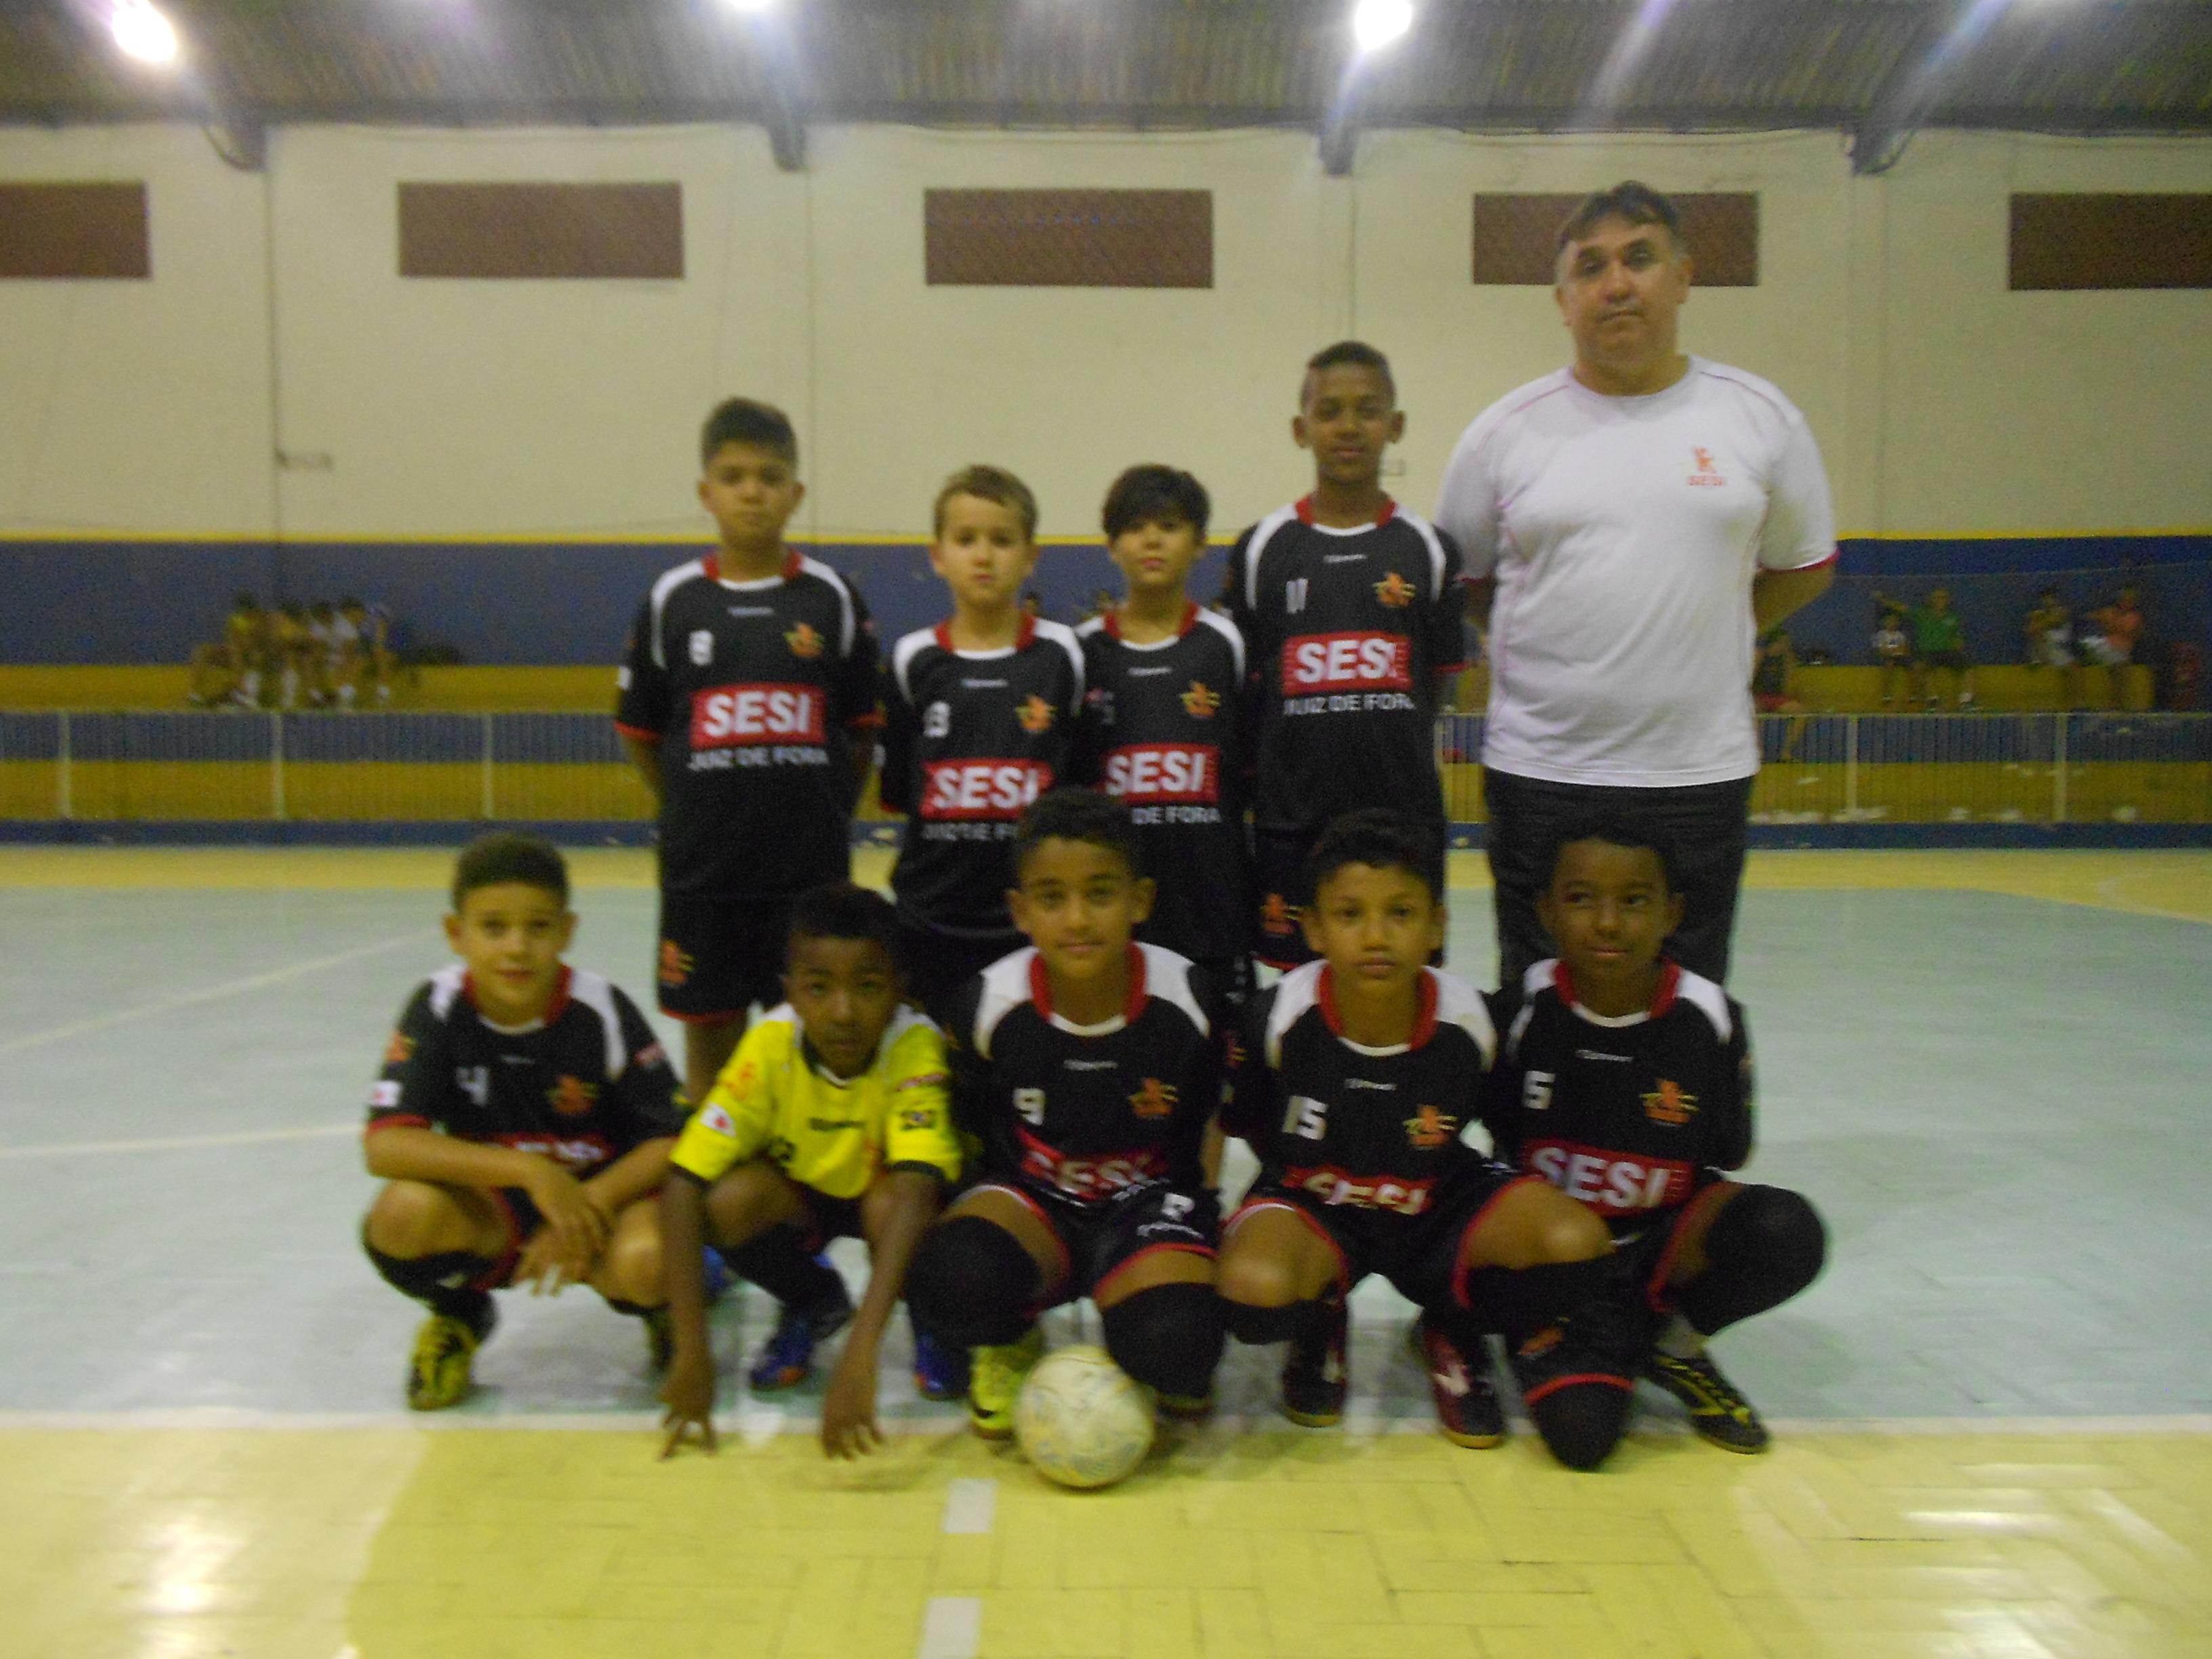 Equipes do Sesi JF vêm disputando a Copa Prefeitura Bahamas de Futsal d887237aba69a